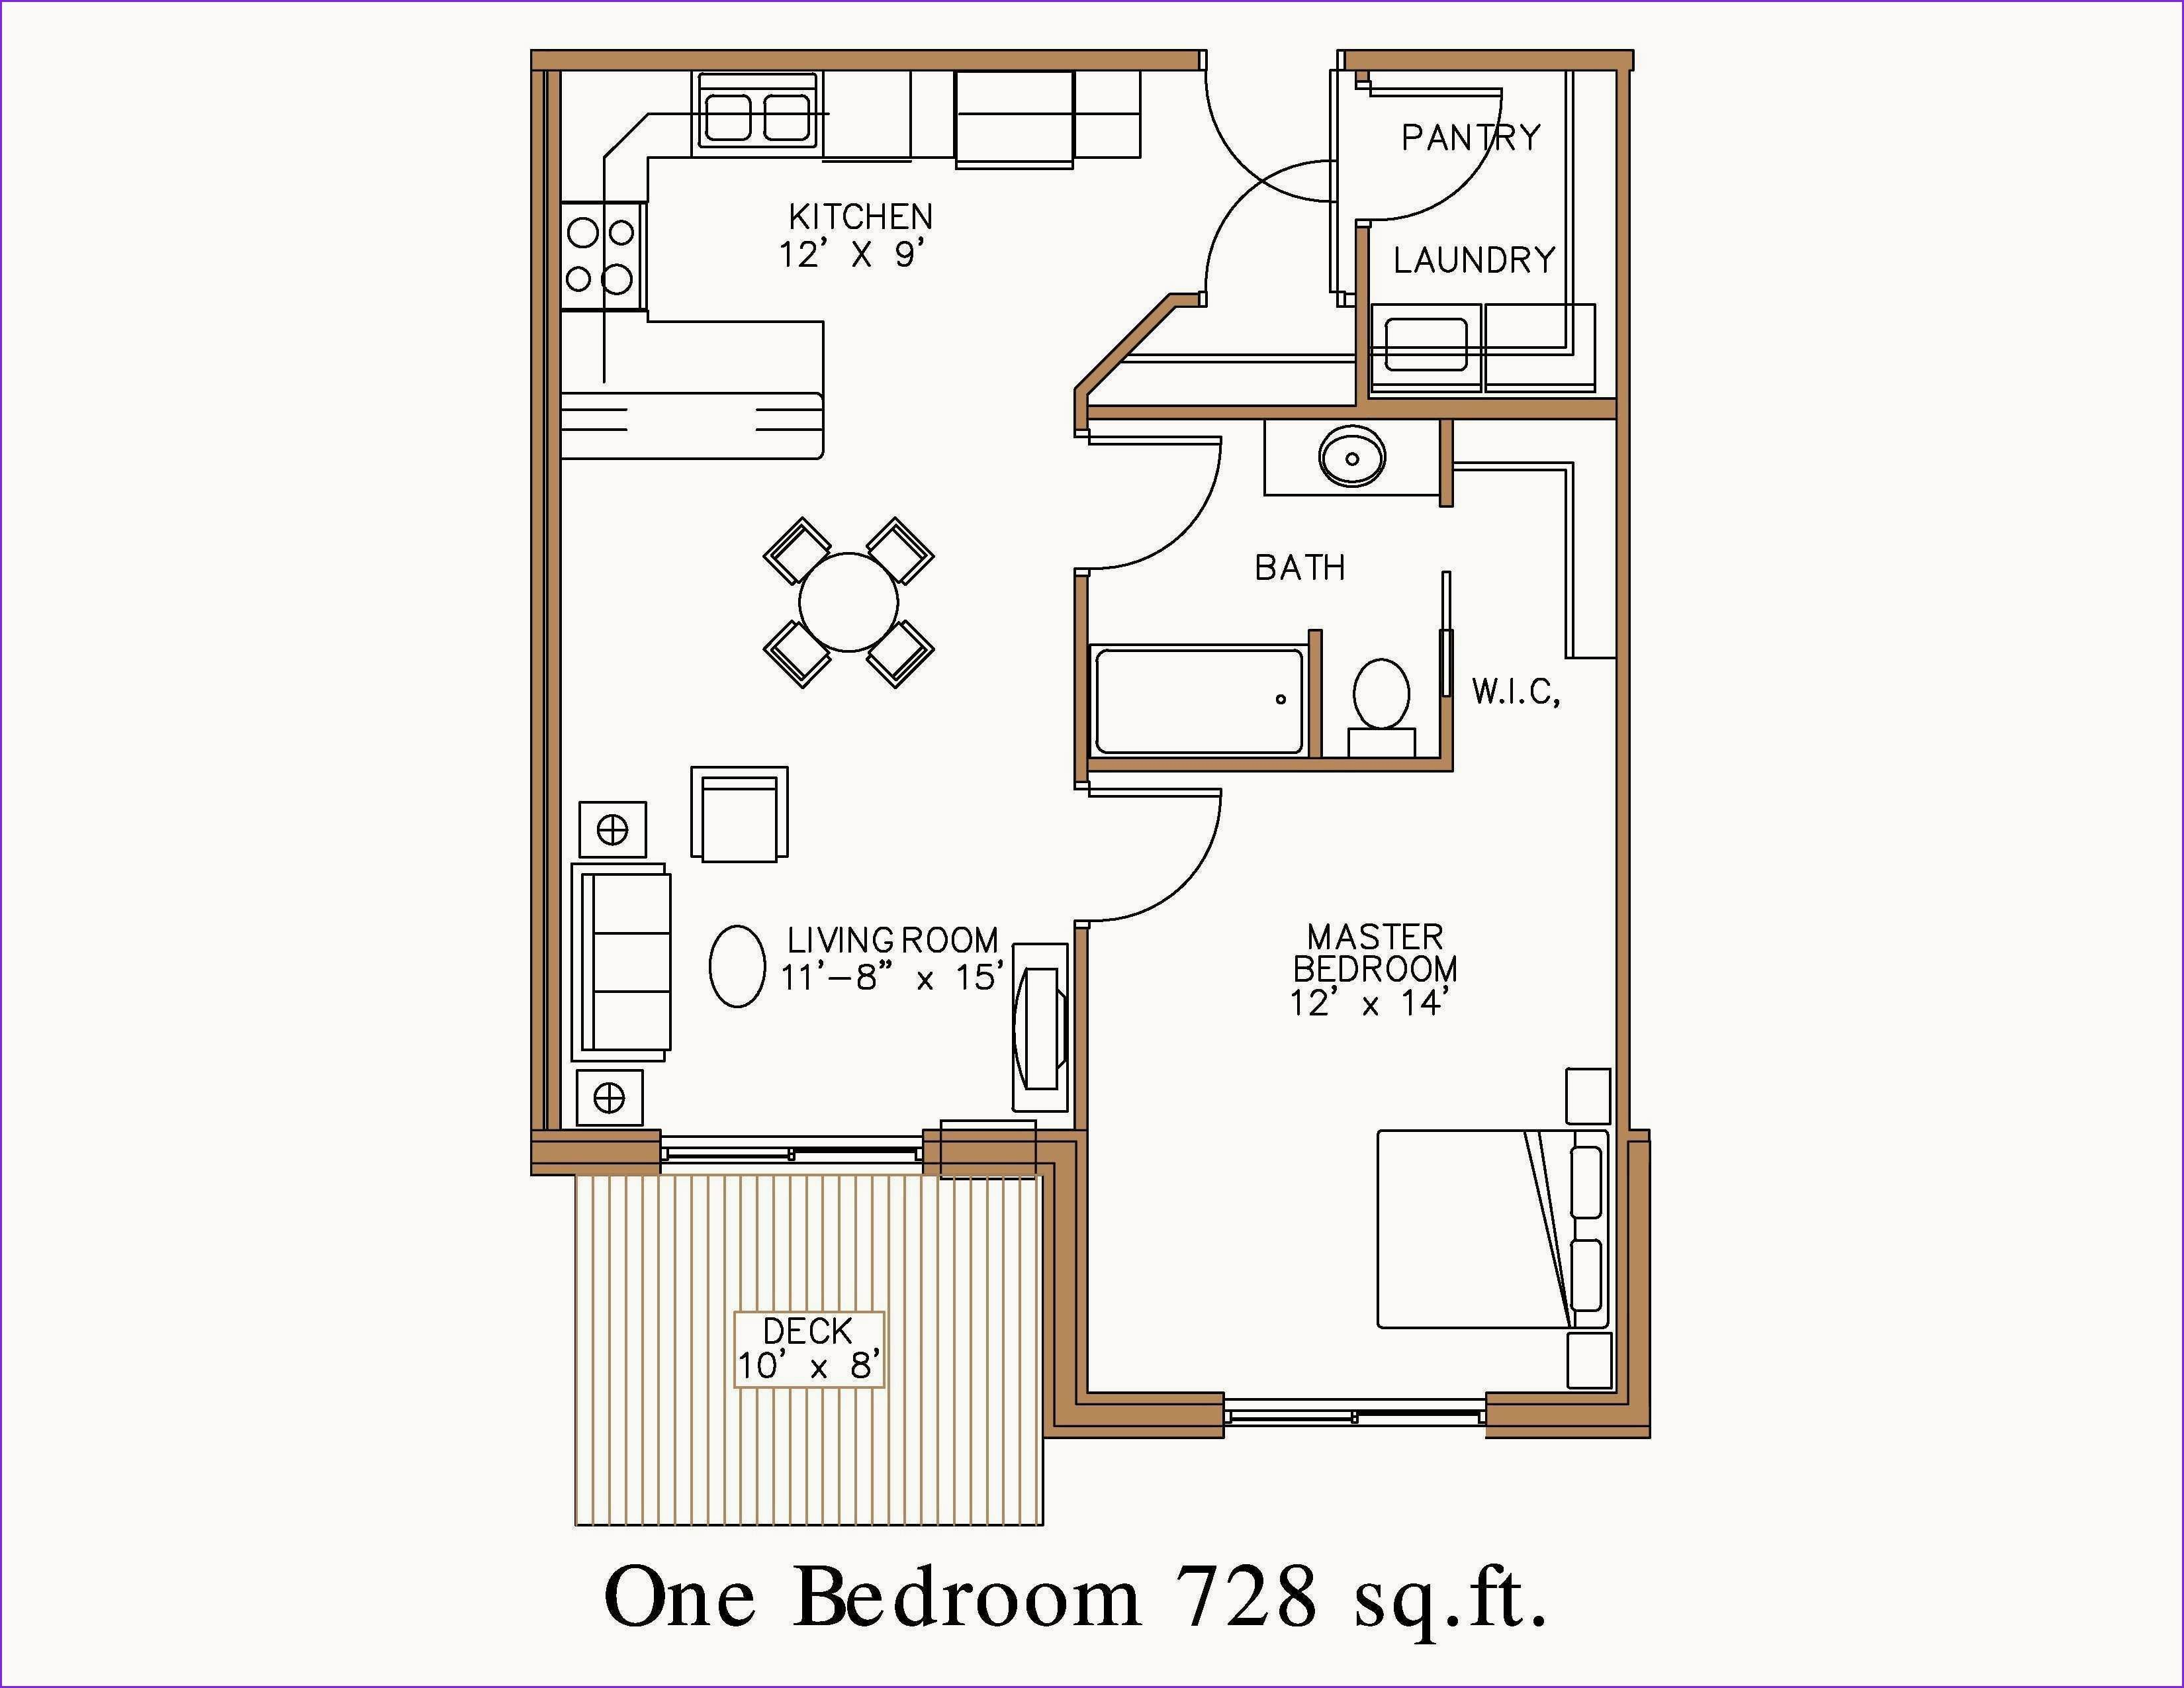 Awesome Saltbox Style Houses Apartment Floor Plans Home Design Floor Plans Shop House Plans